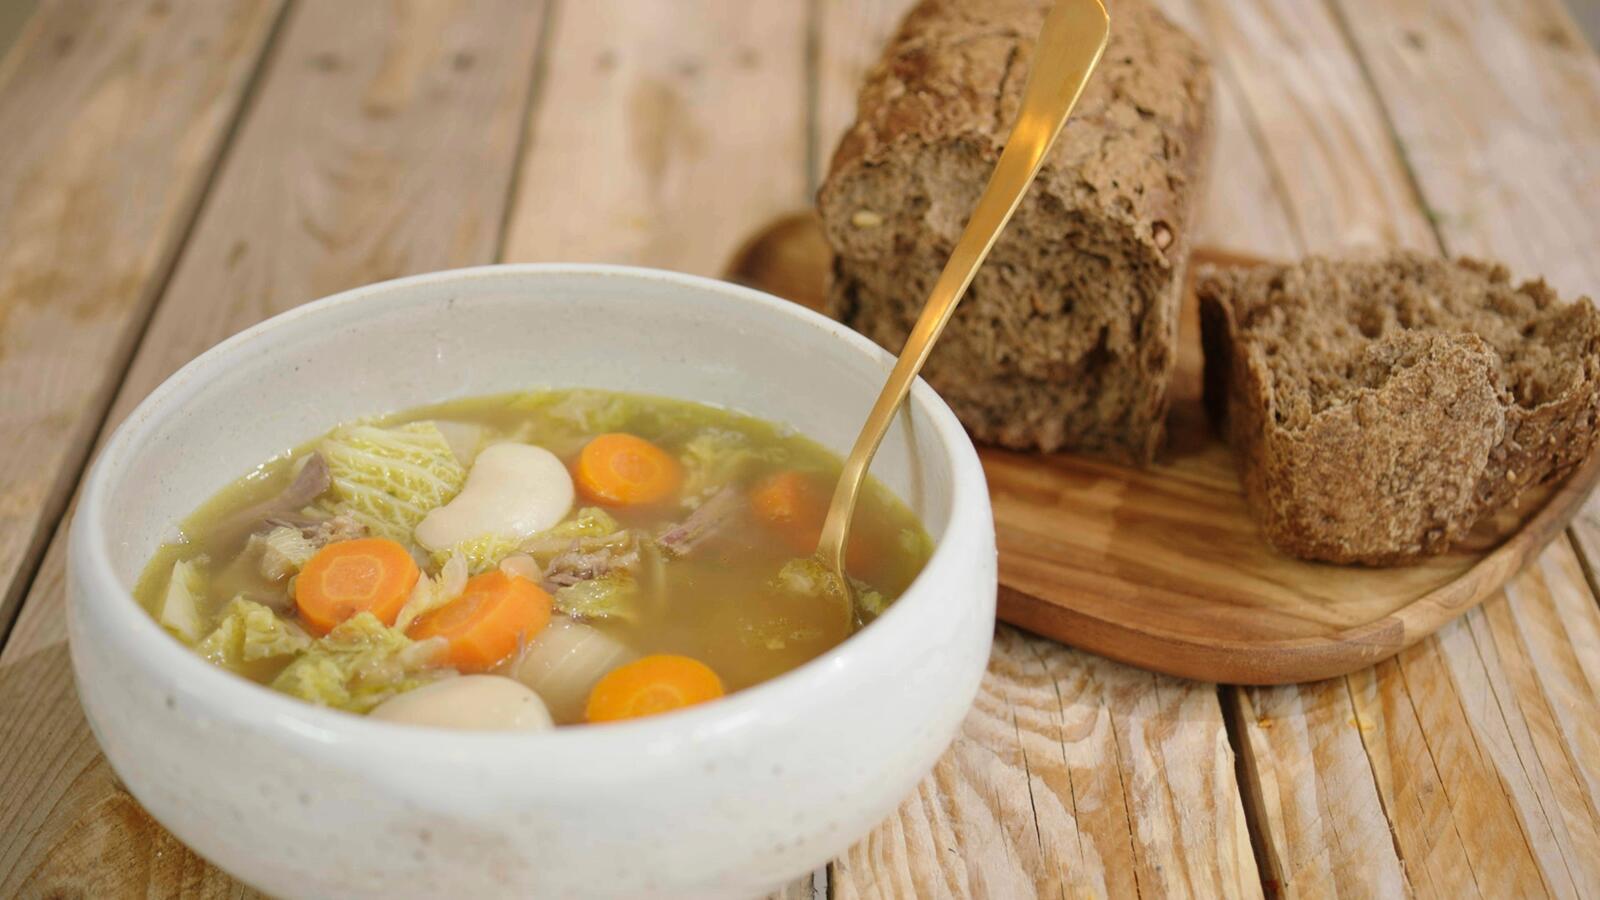 Maaltijdsoep met soepvlees, kool en rapen